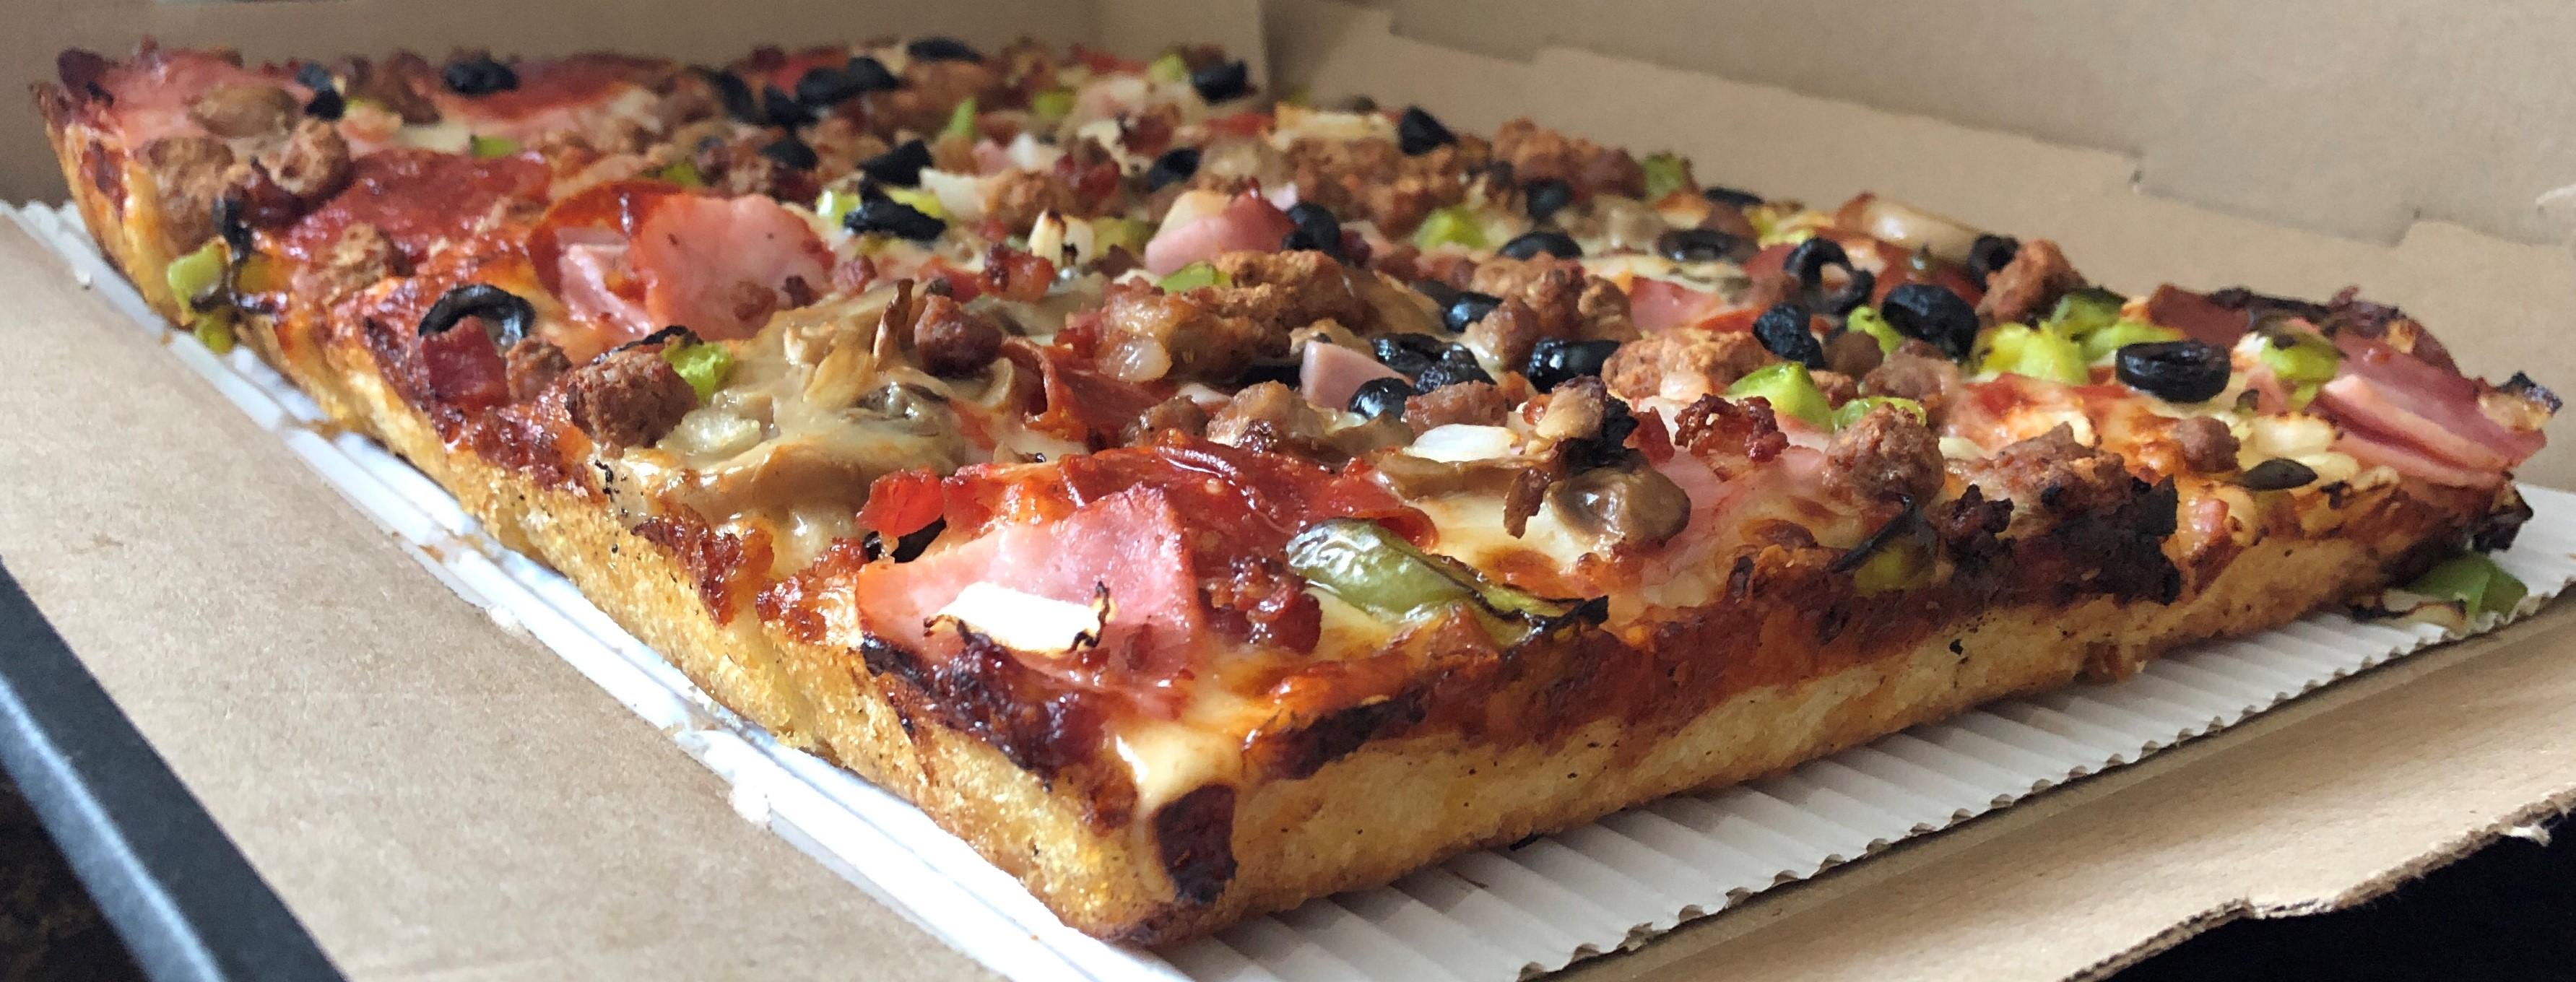 Detroit-style pizza.jpg